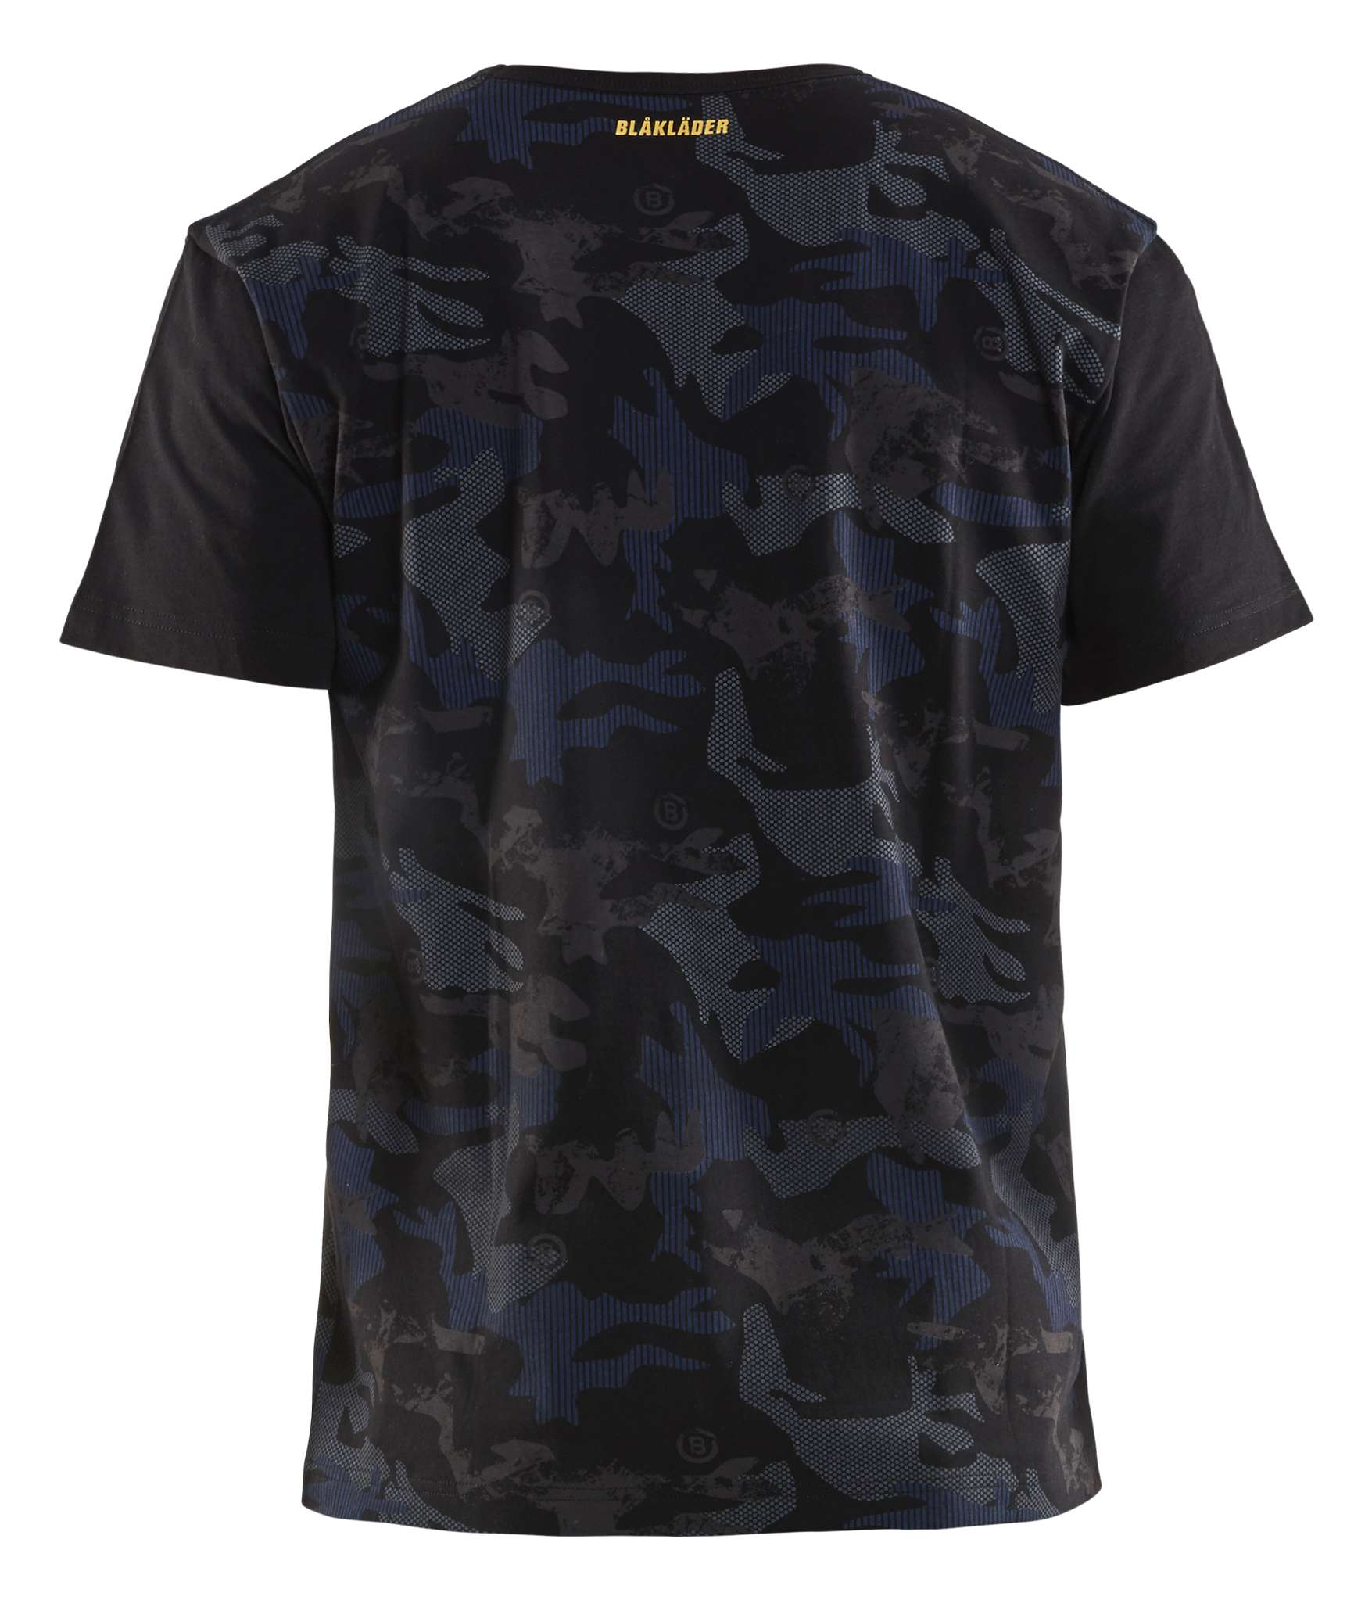 Blaklader T-shirts 94071042 zwart-donkergrijs(9998)